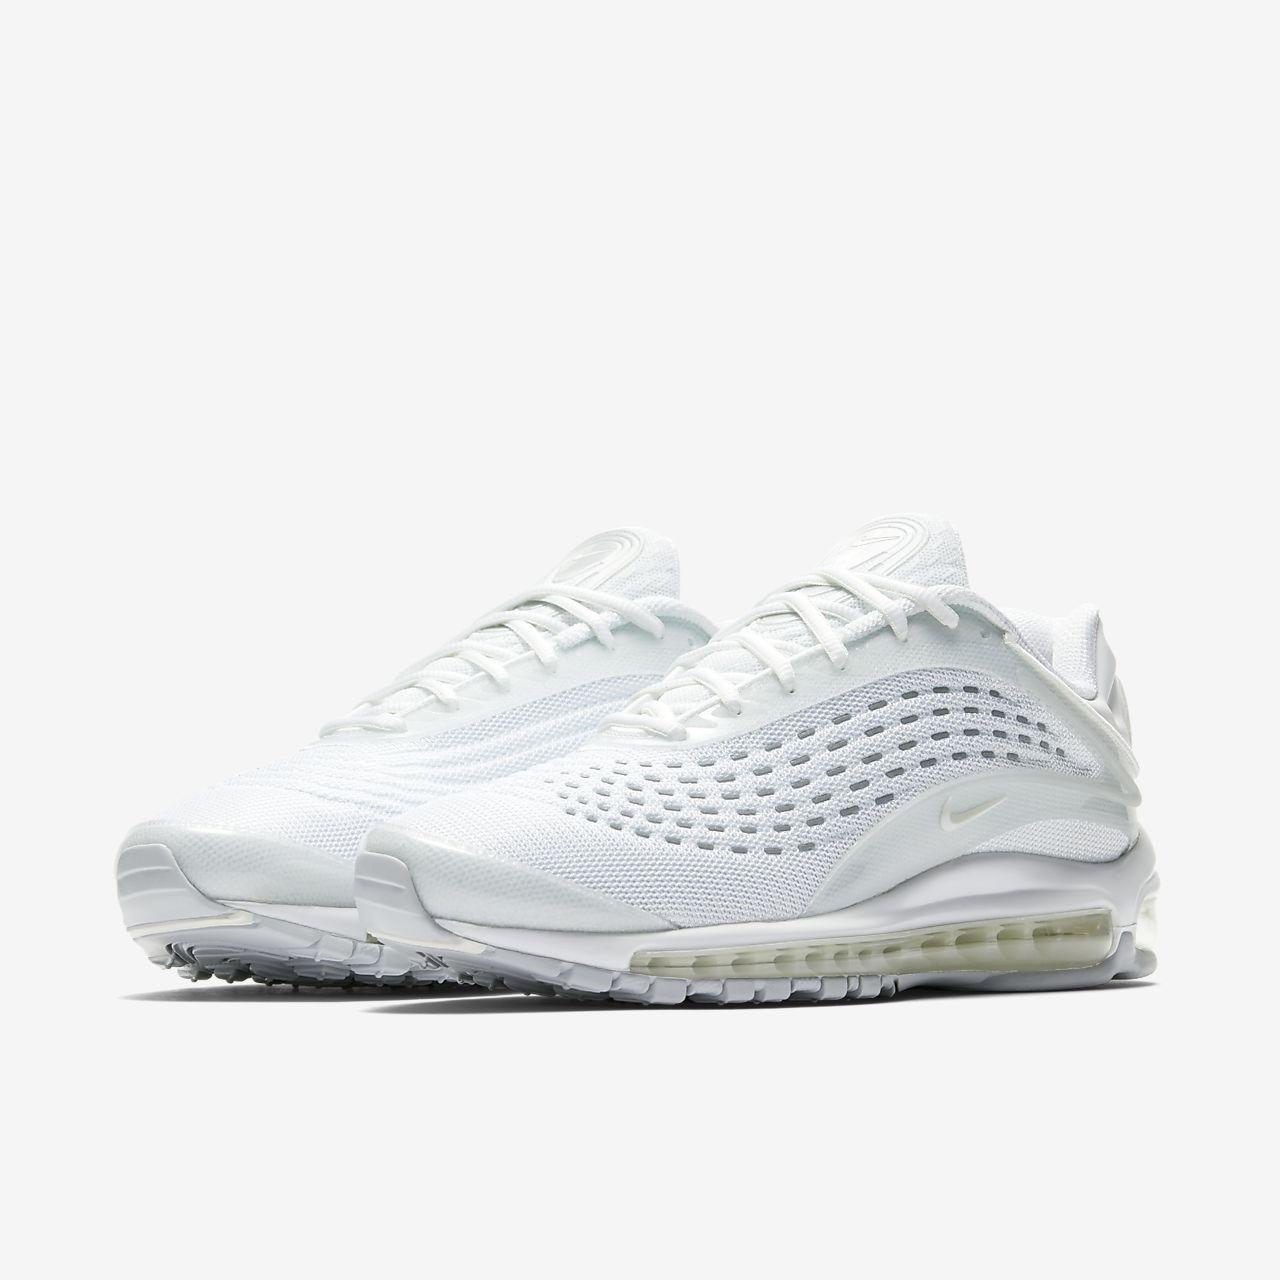 separation shoes 39cd5 bdd73 ... Nike Air Max Deluxe Men s Shoe